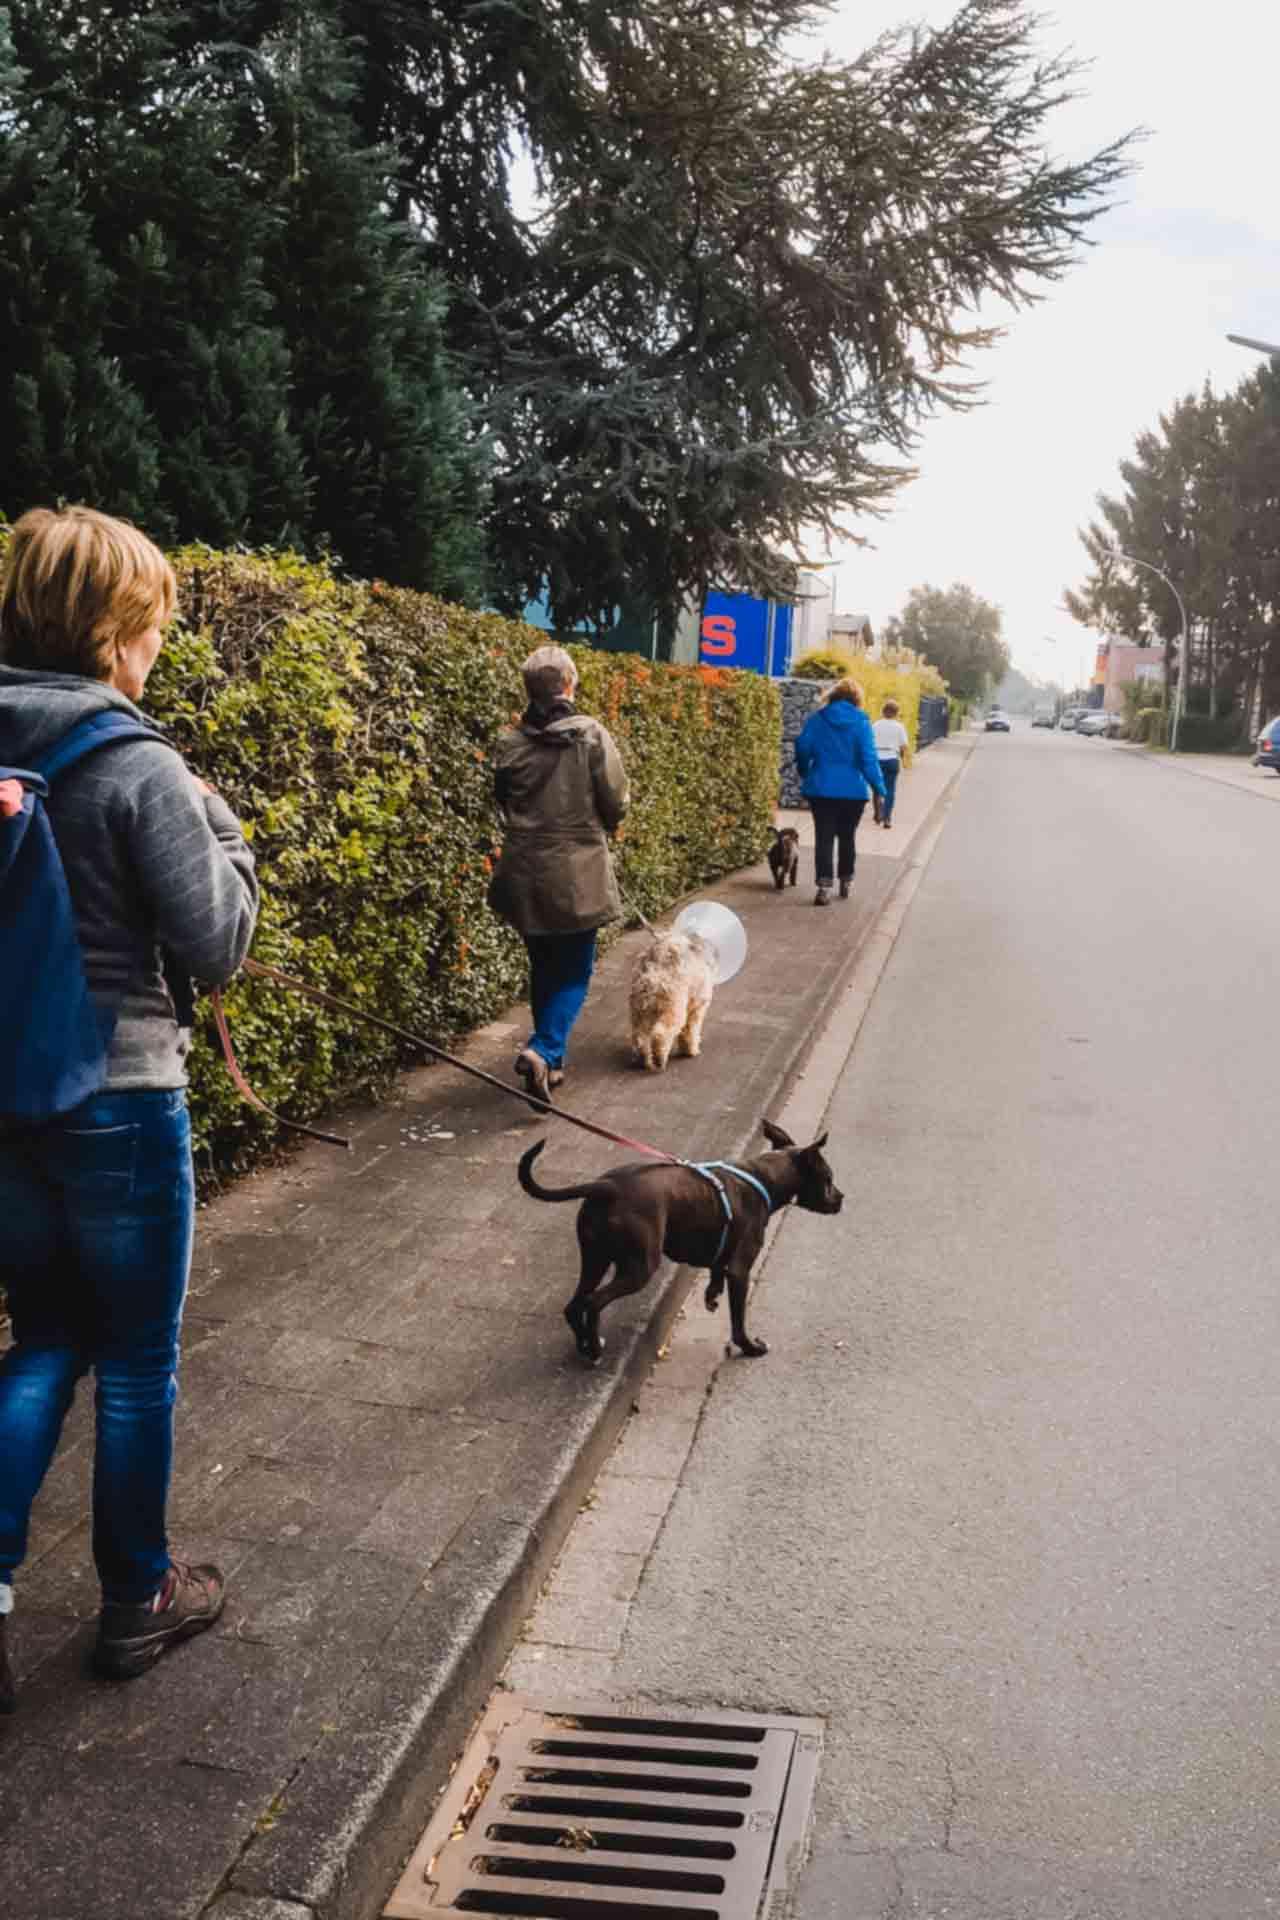 hundpunkt_hundeschule_muenster-ibbenbueren-kurs-terrain-training-hundewanderung